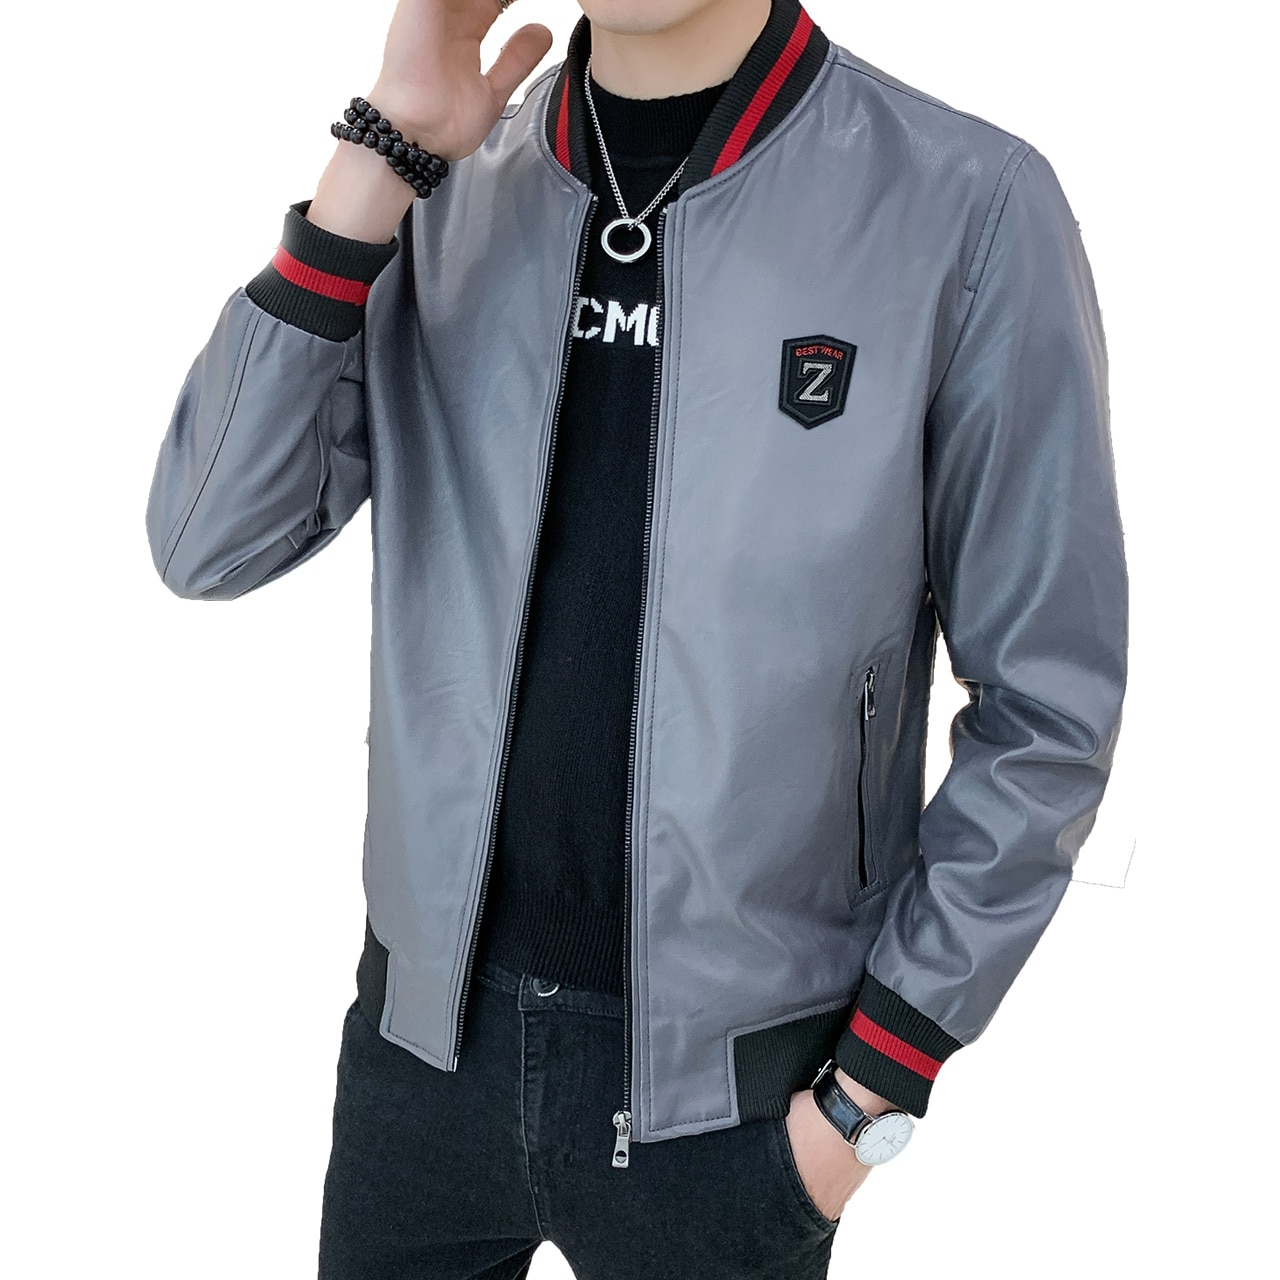 Chaqueta de cuero para hombre, chaqueta de invierno ajustada para hombre, chaqueta de cuero para hombre A521-8362